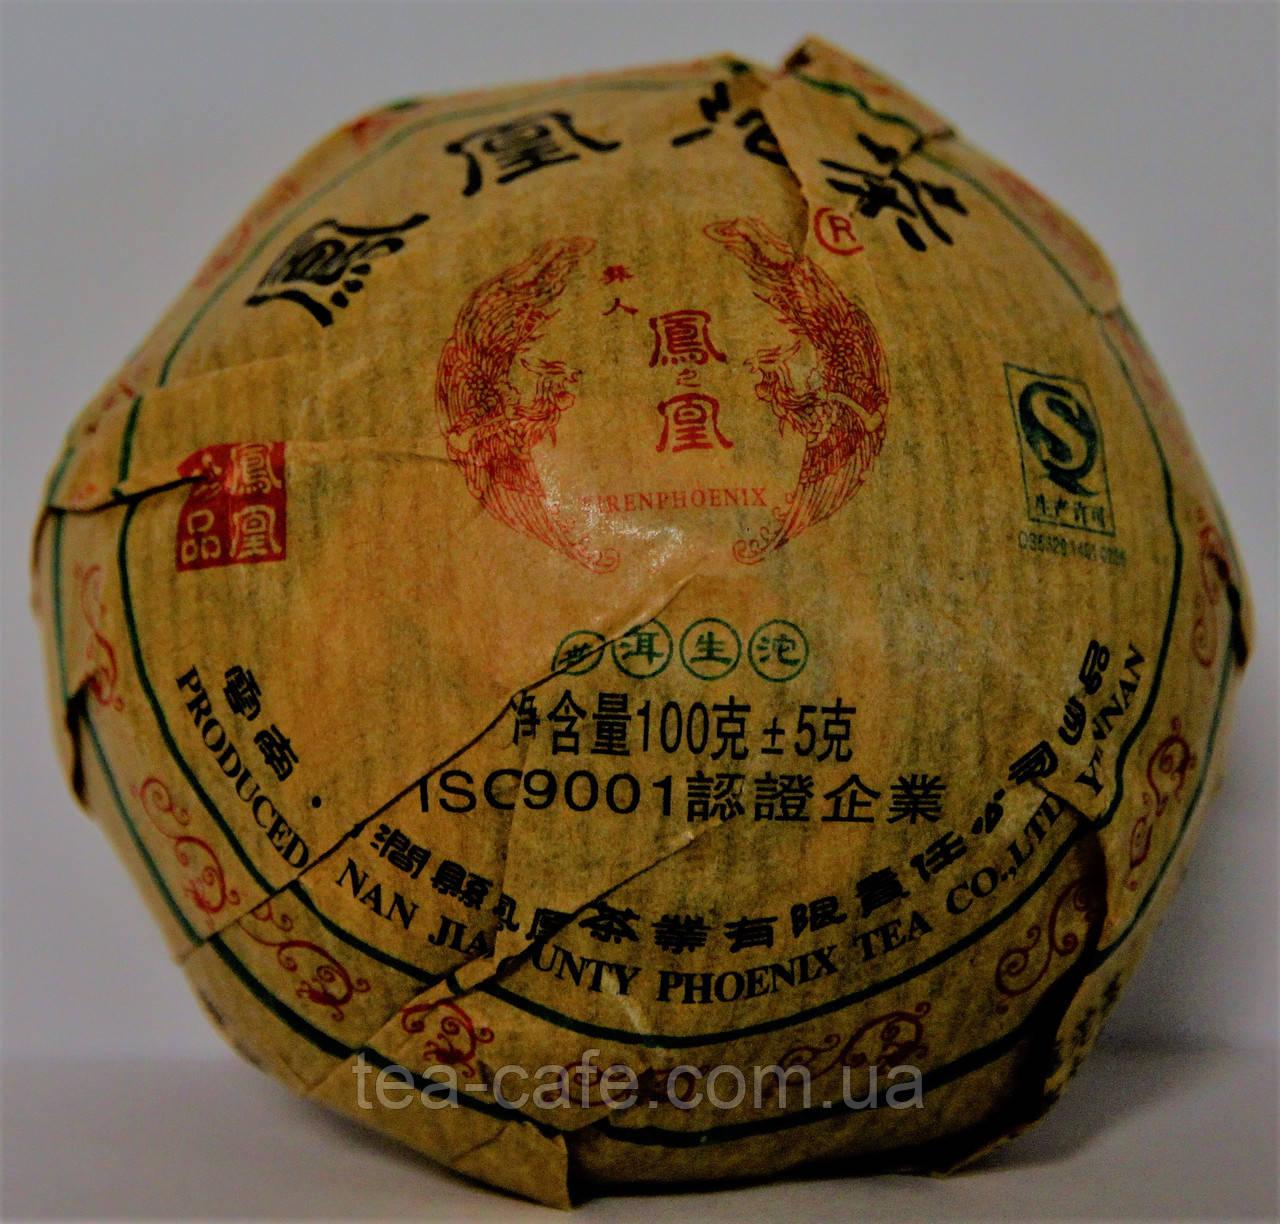 Чай зеленый Китайский  Пуэр Шен 100г.№612